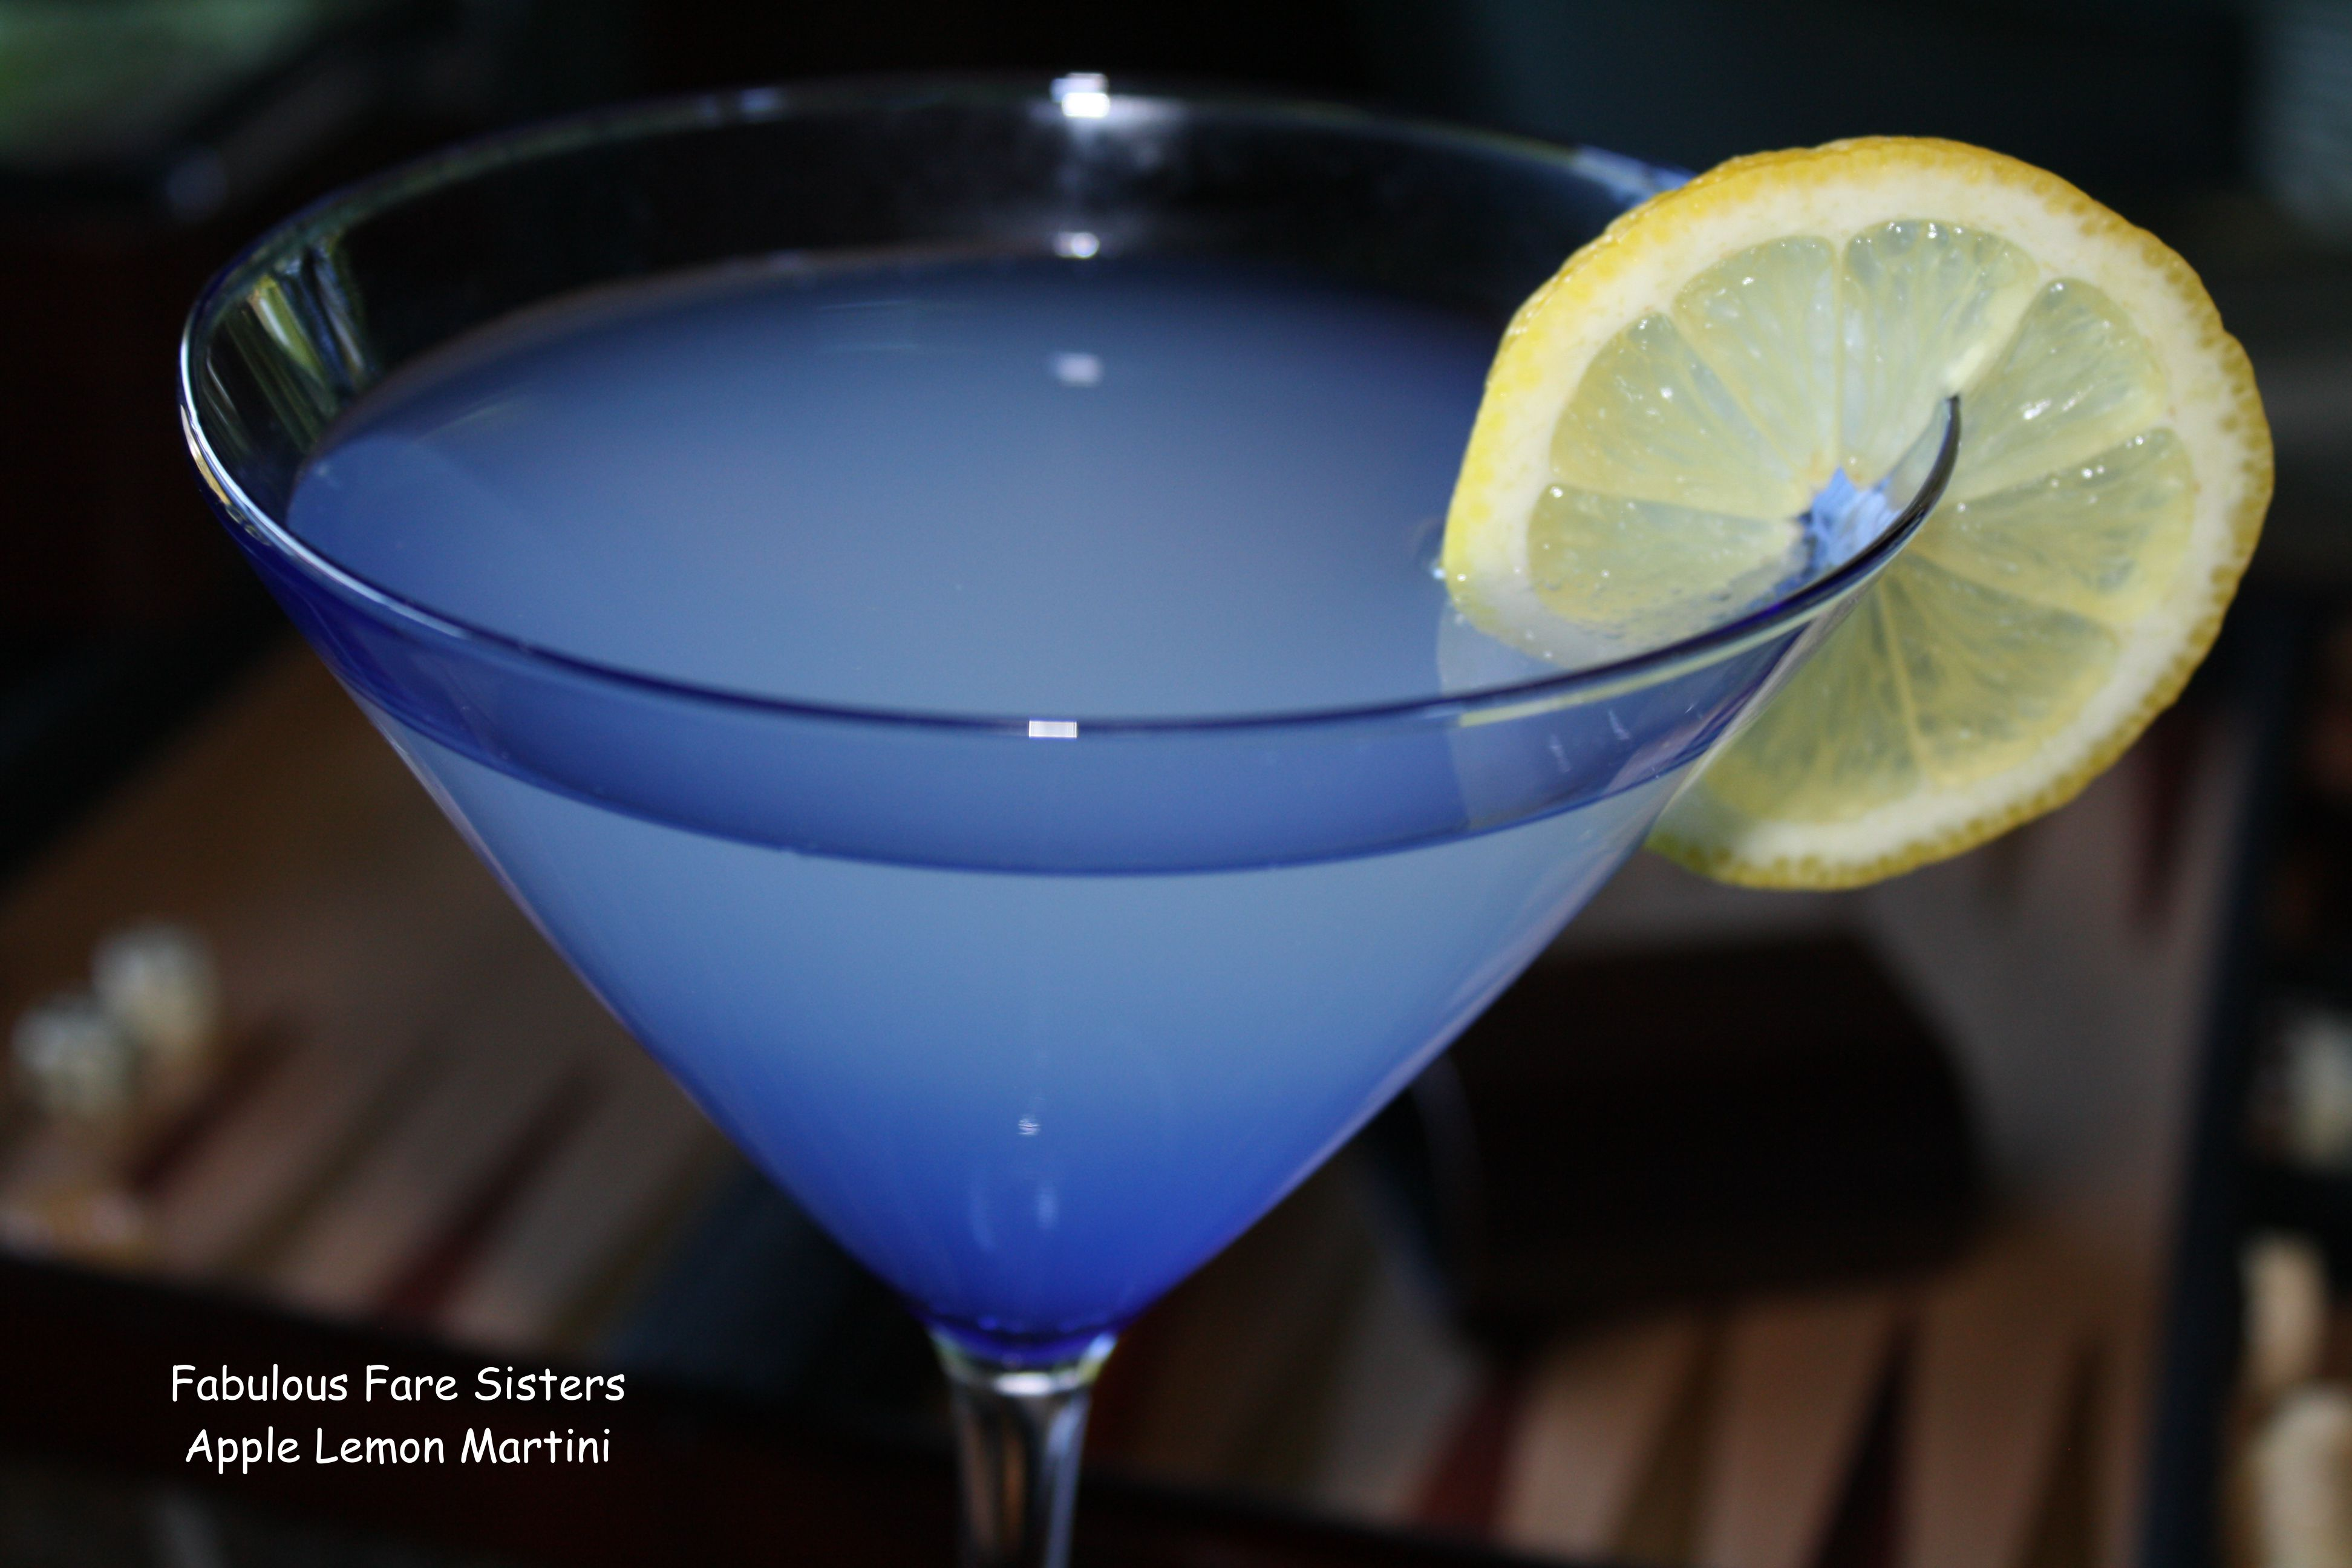 Apple Lemon Martini